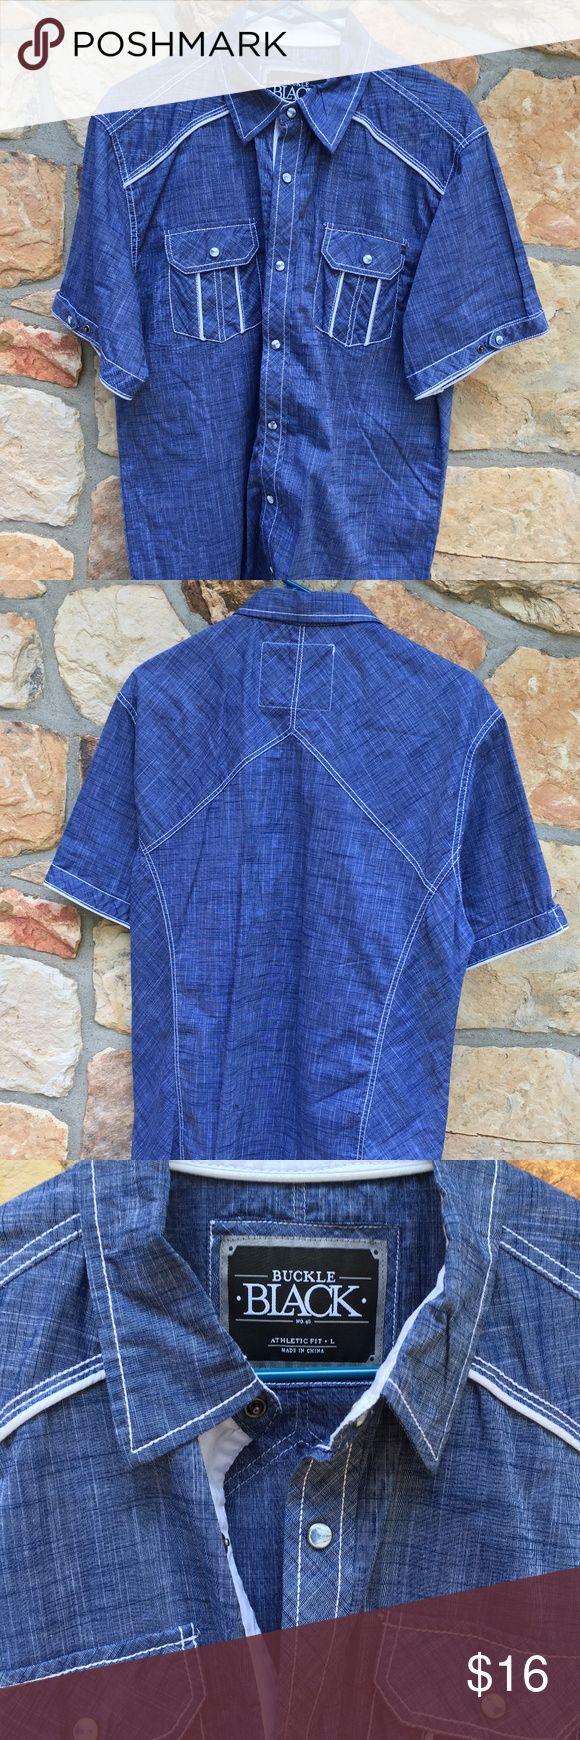 Buckle Black Denim Short Sleeve Button Down Shirt Men's Buckle Black Short Sleeve Button Down Shirt  Great Condition Athletic Fit  Men's Size Large (L) Buckle Shirts Casual Button Down Shirts